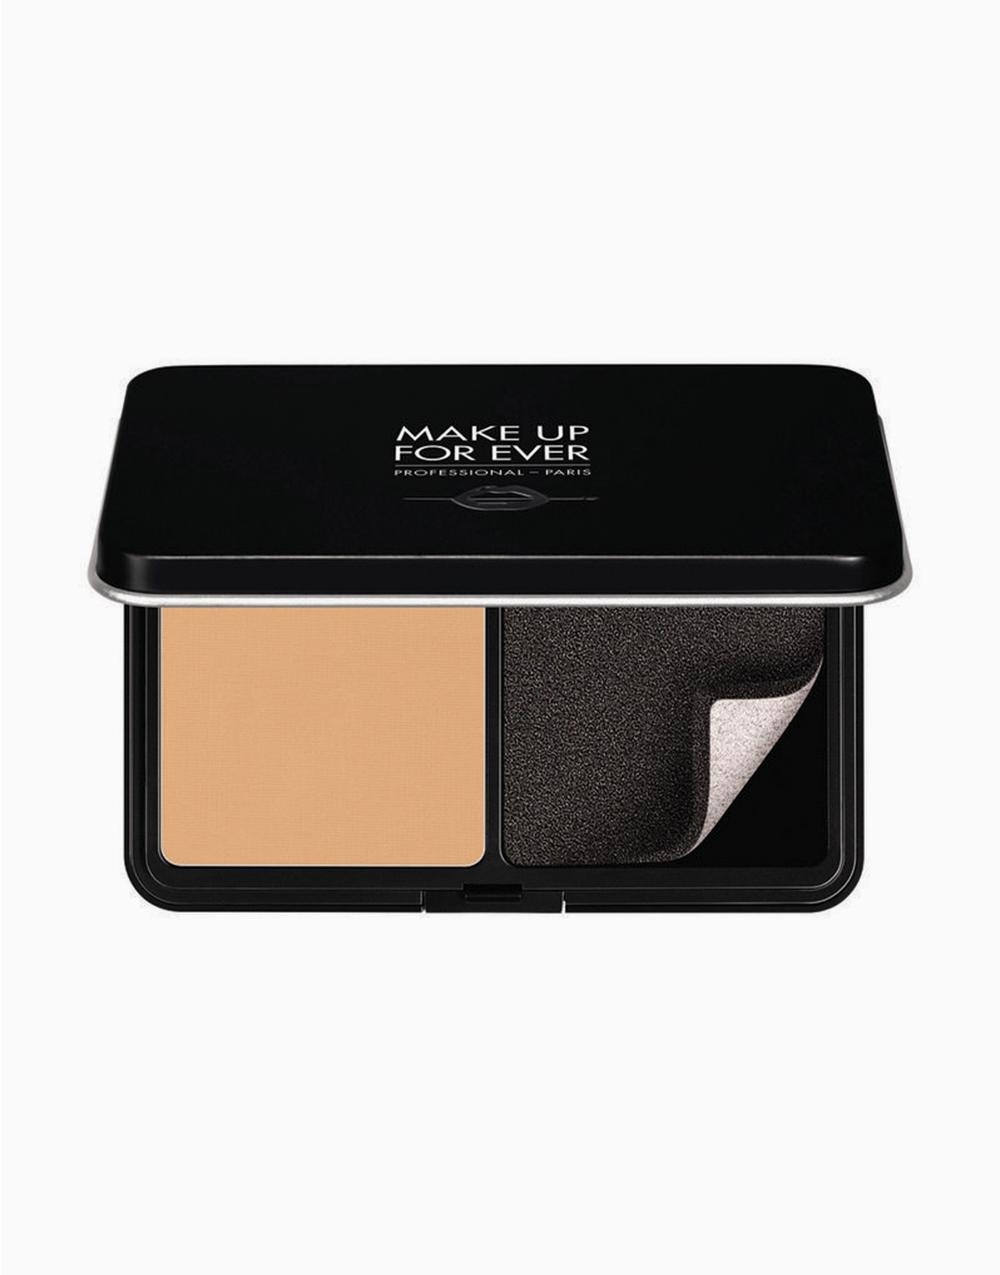 Matte Velvet Skin Compact (11g) by Make Up For Ever | Y305